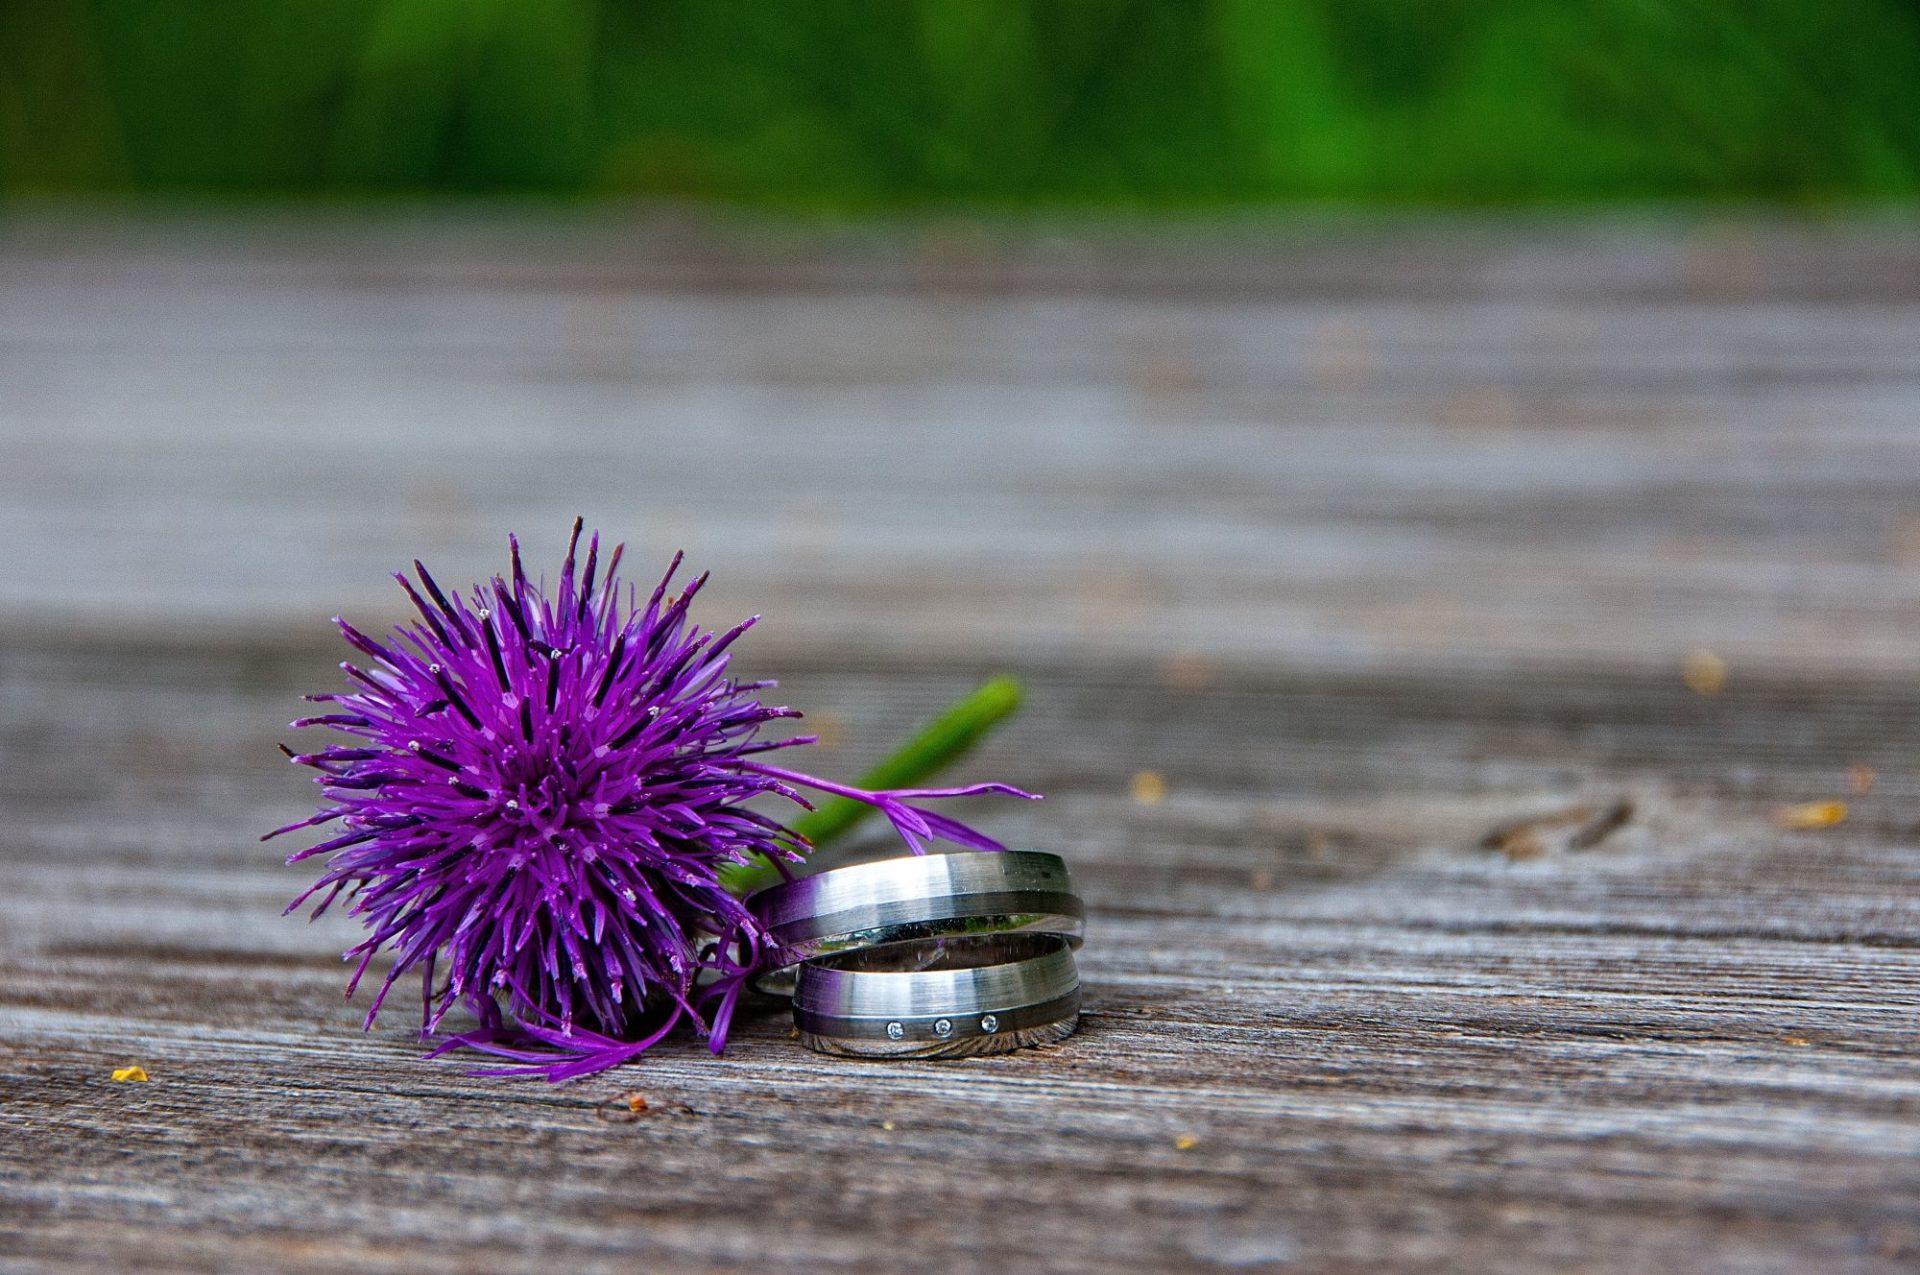 Ringe mit lila Blume